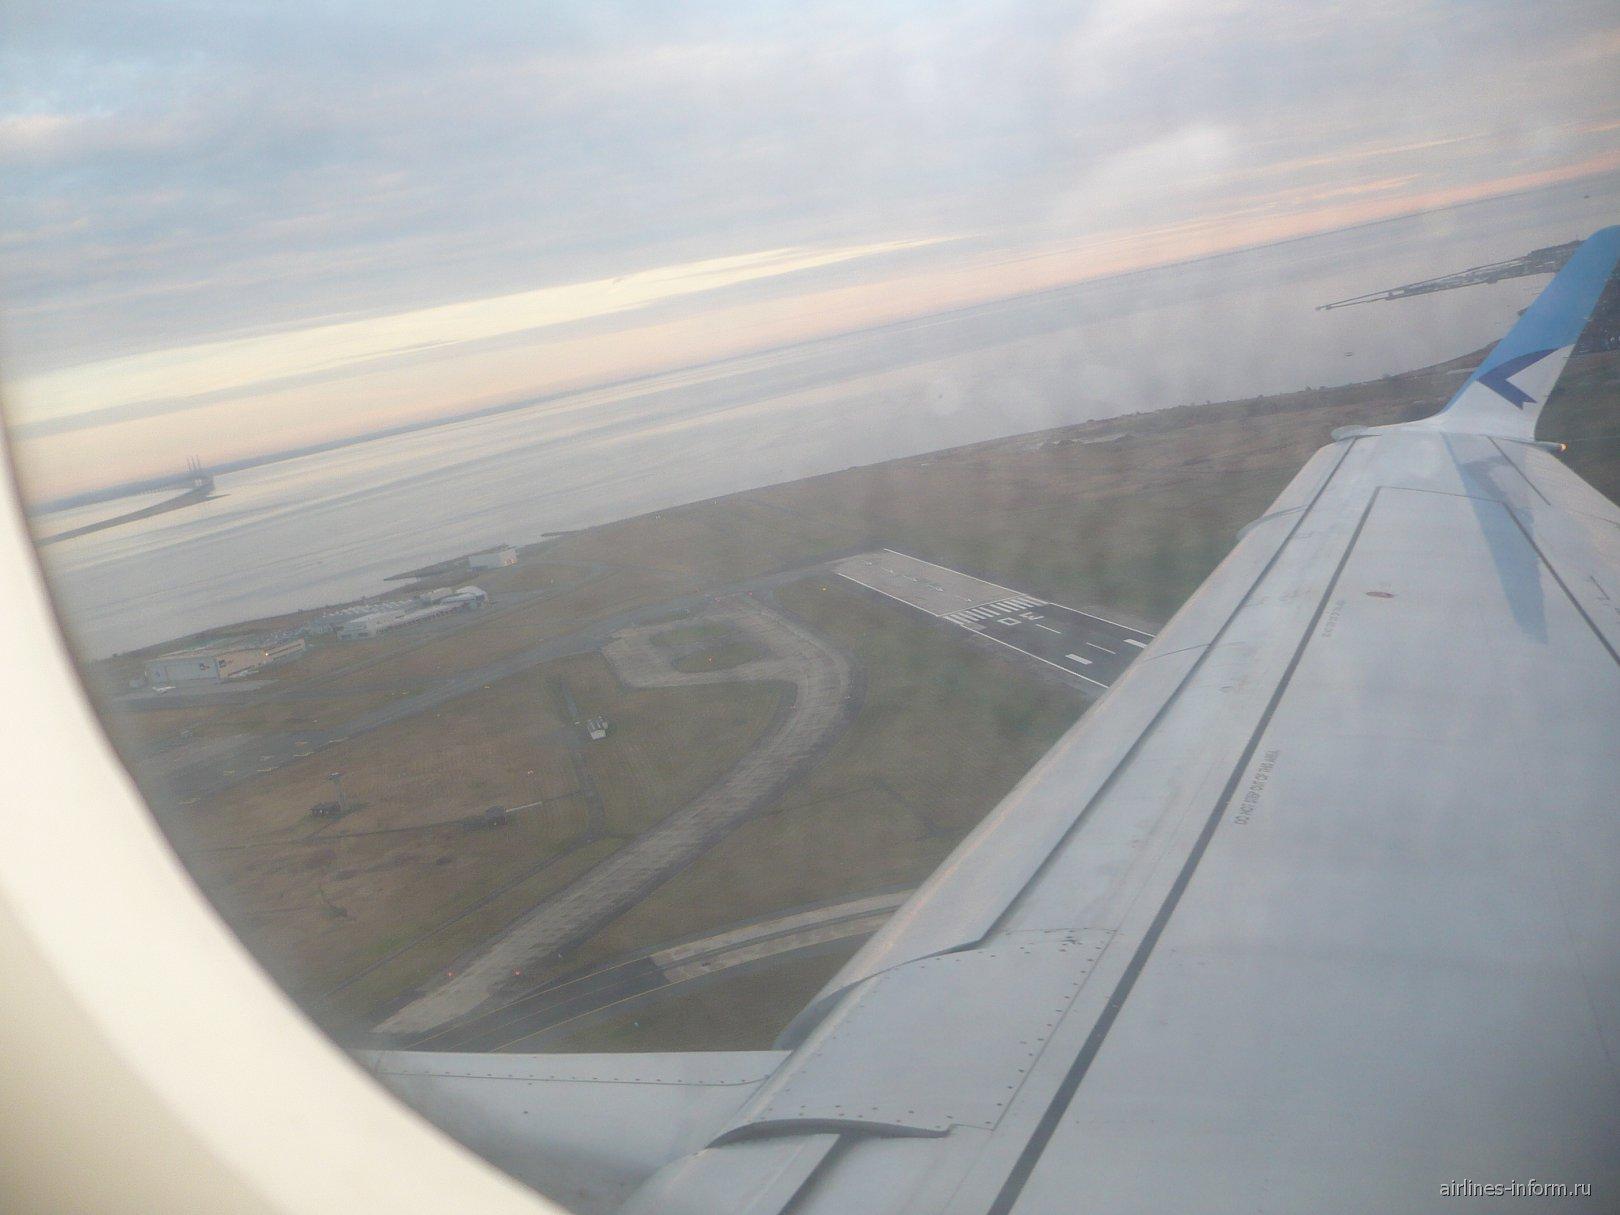 Рейс Копенгаген-Таллинн авиакомпании Estonian Air